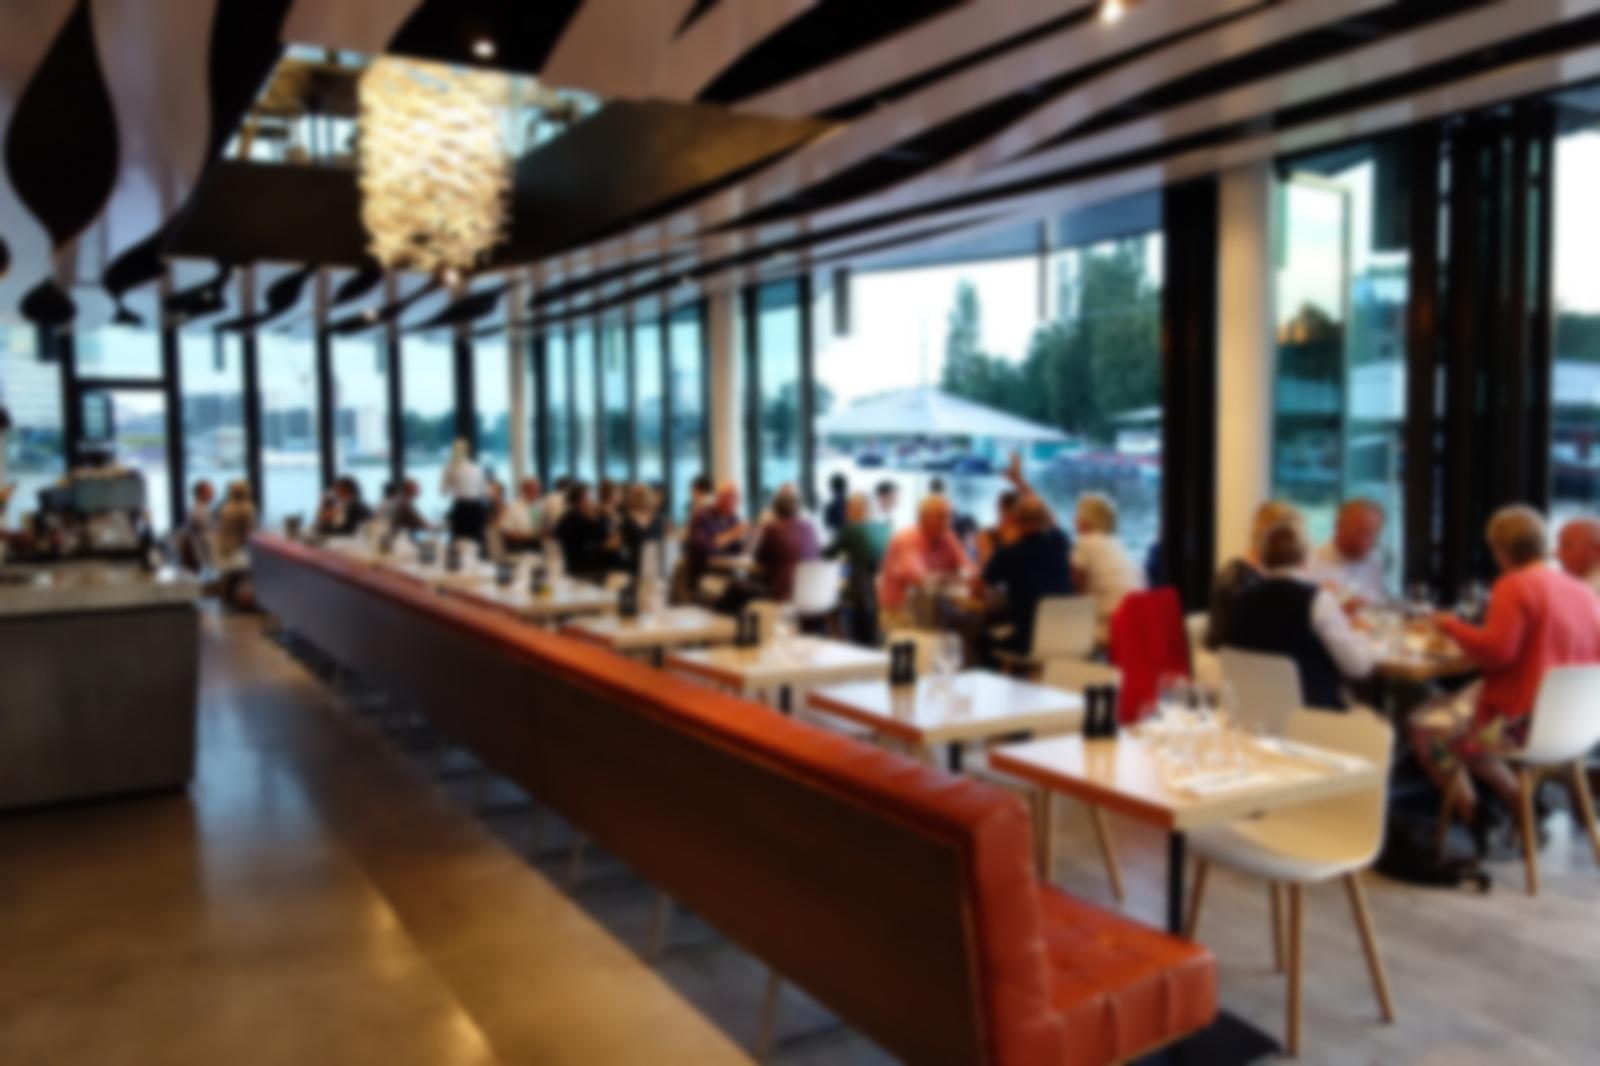 Analytics Best Practices for Measuring Restaurant Performance